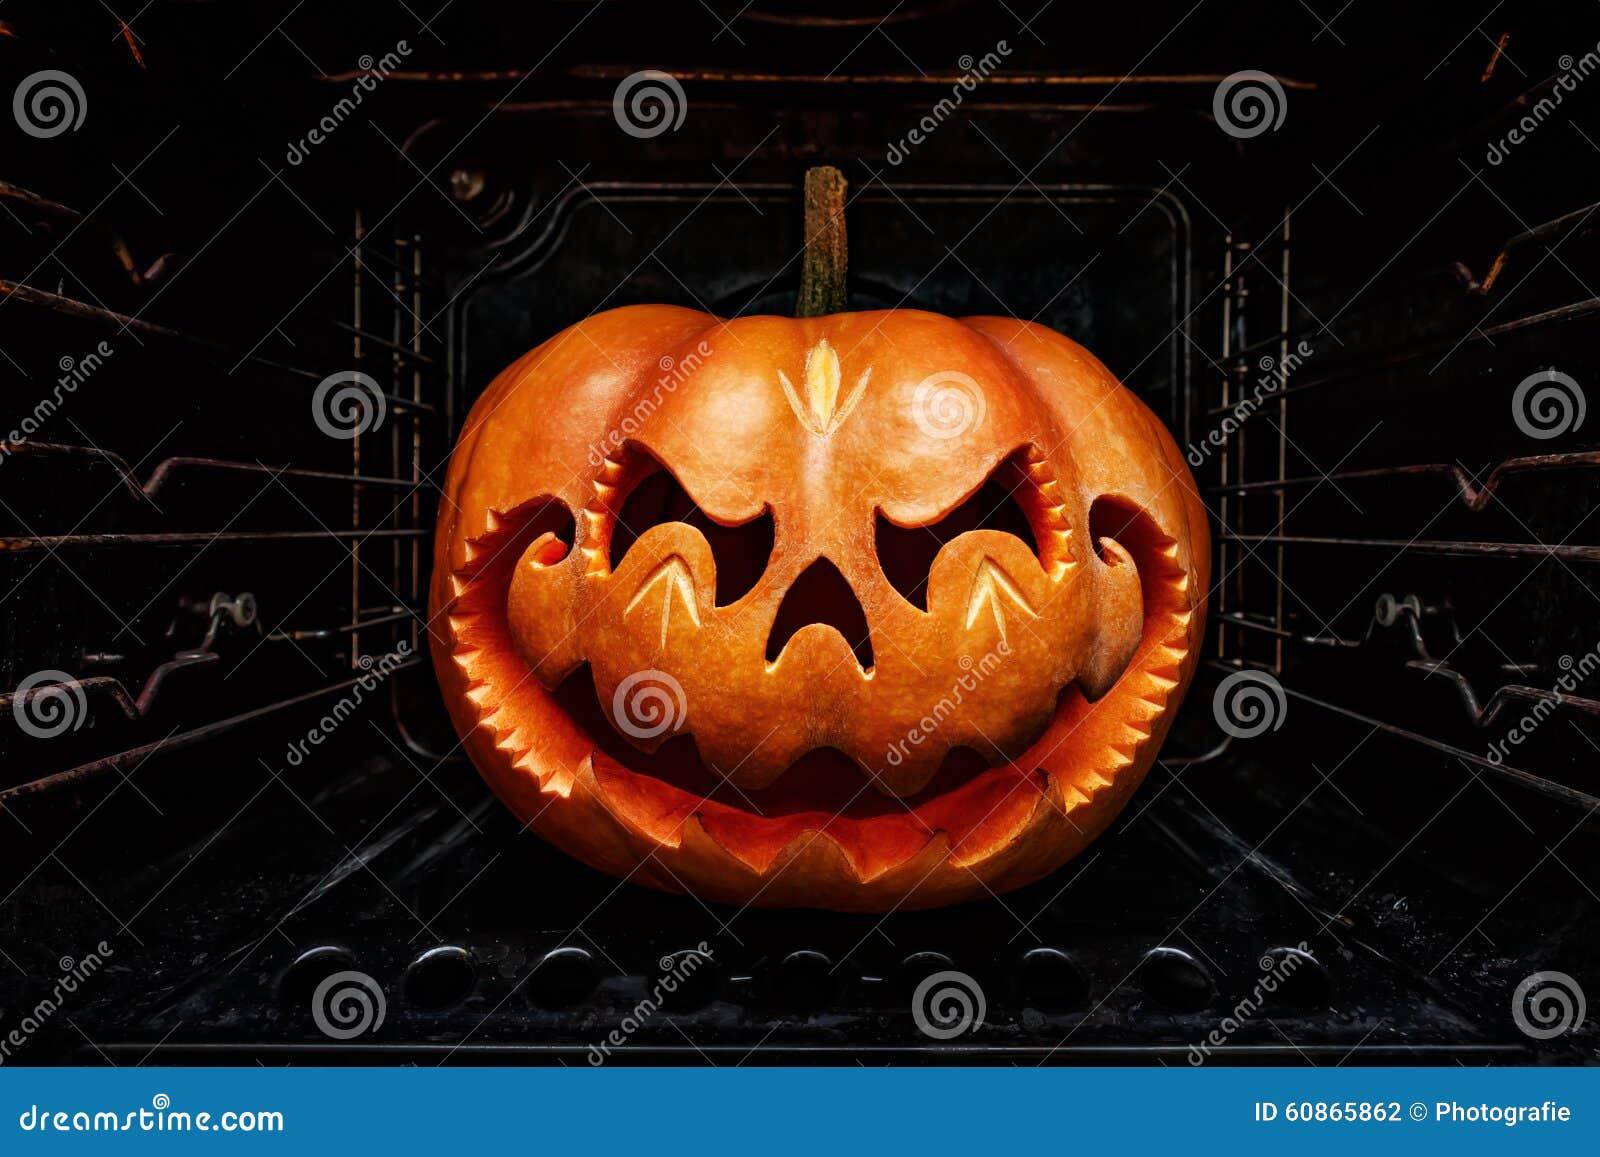 Funny Halloween Pumpkin Resembling A Chinese Dragon Head, Roast ...